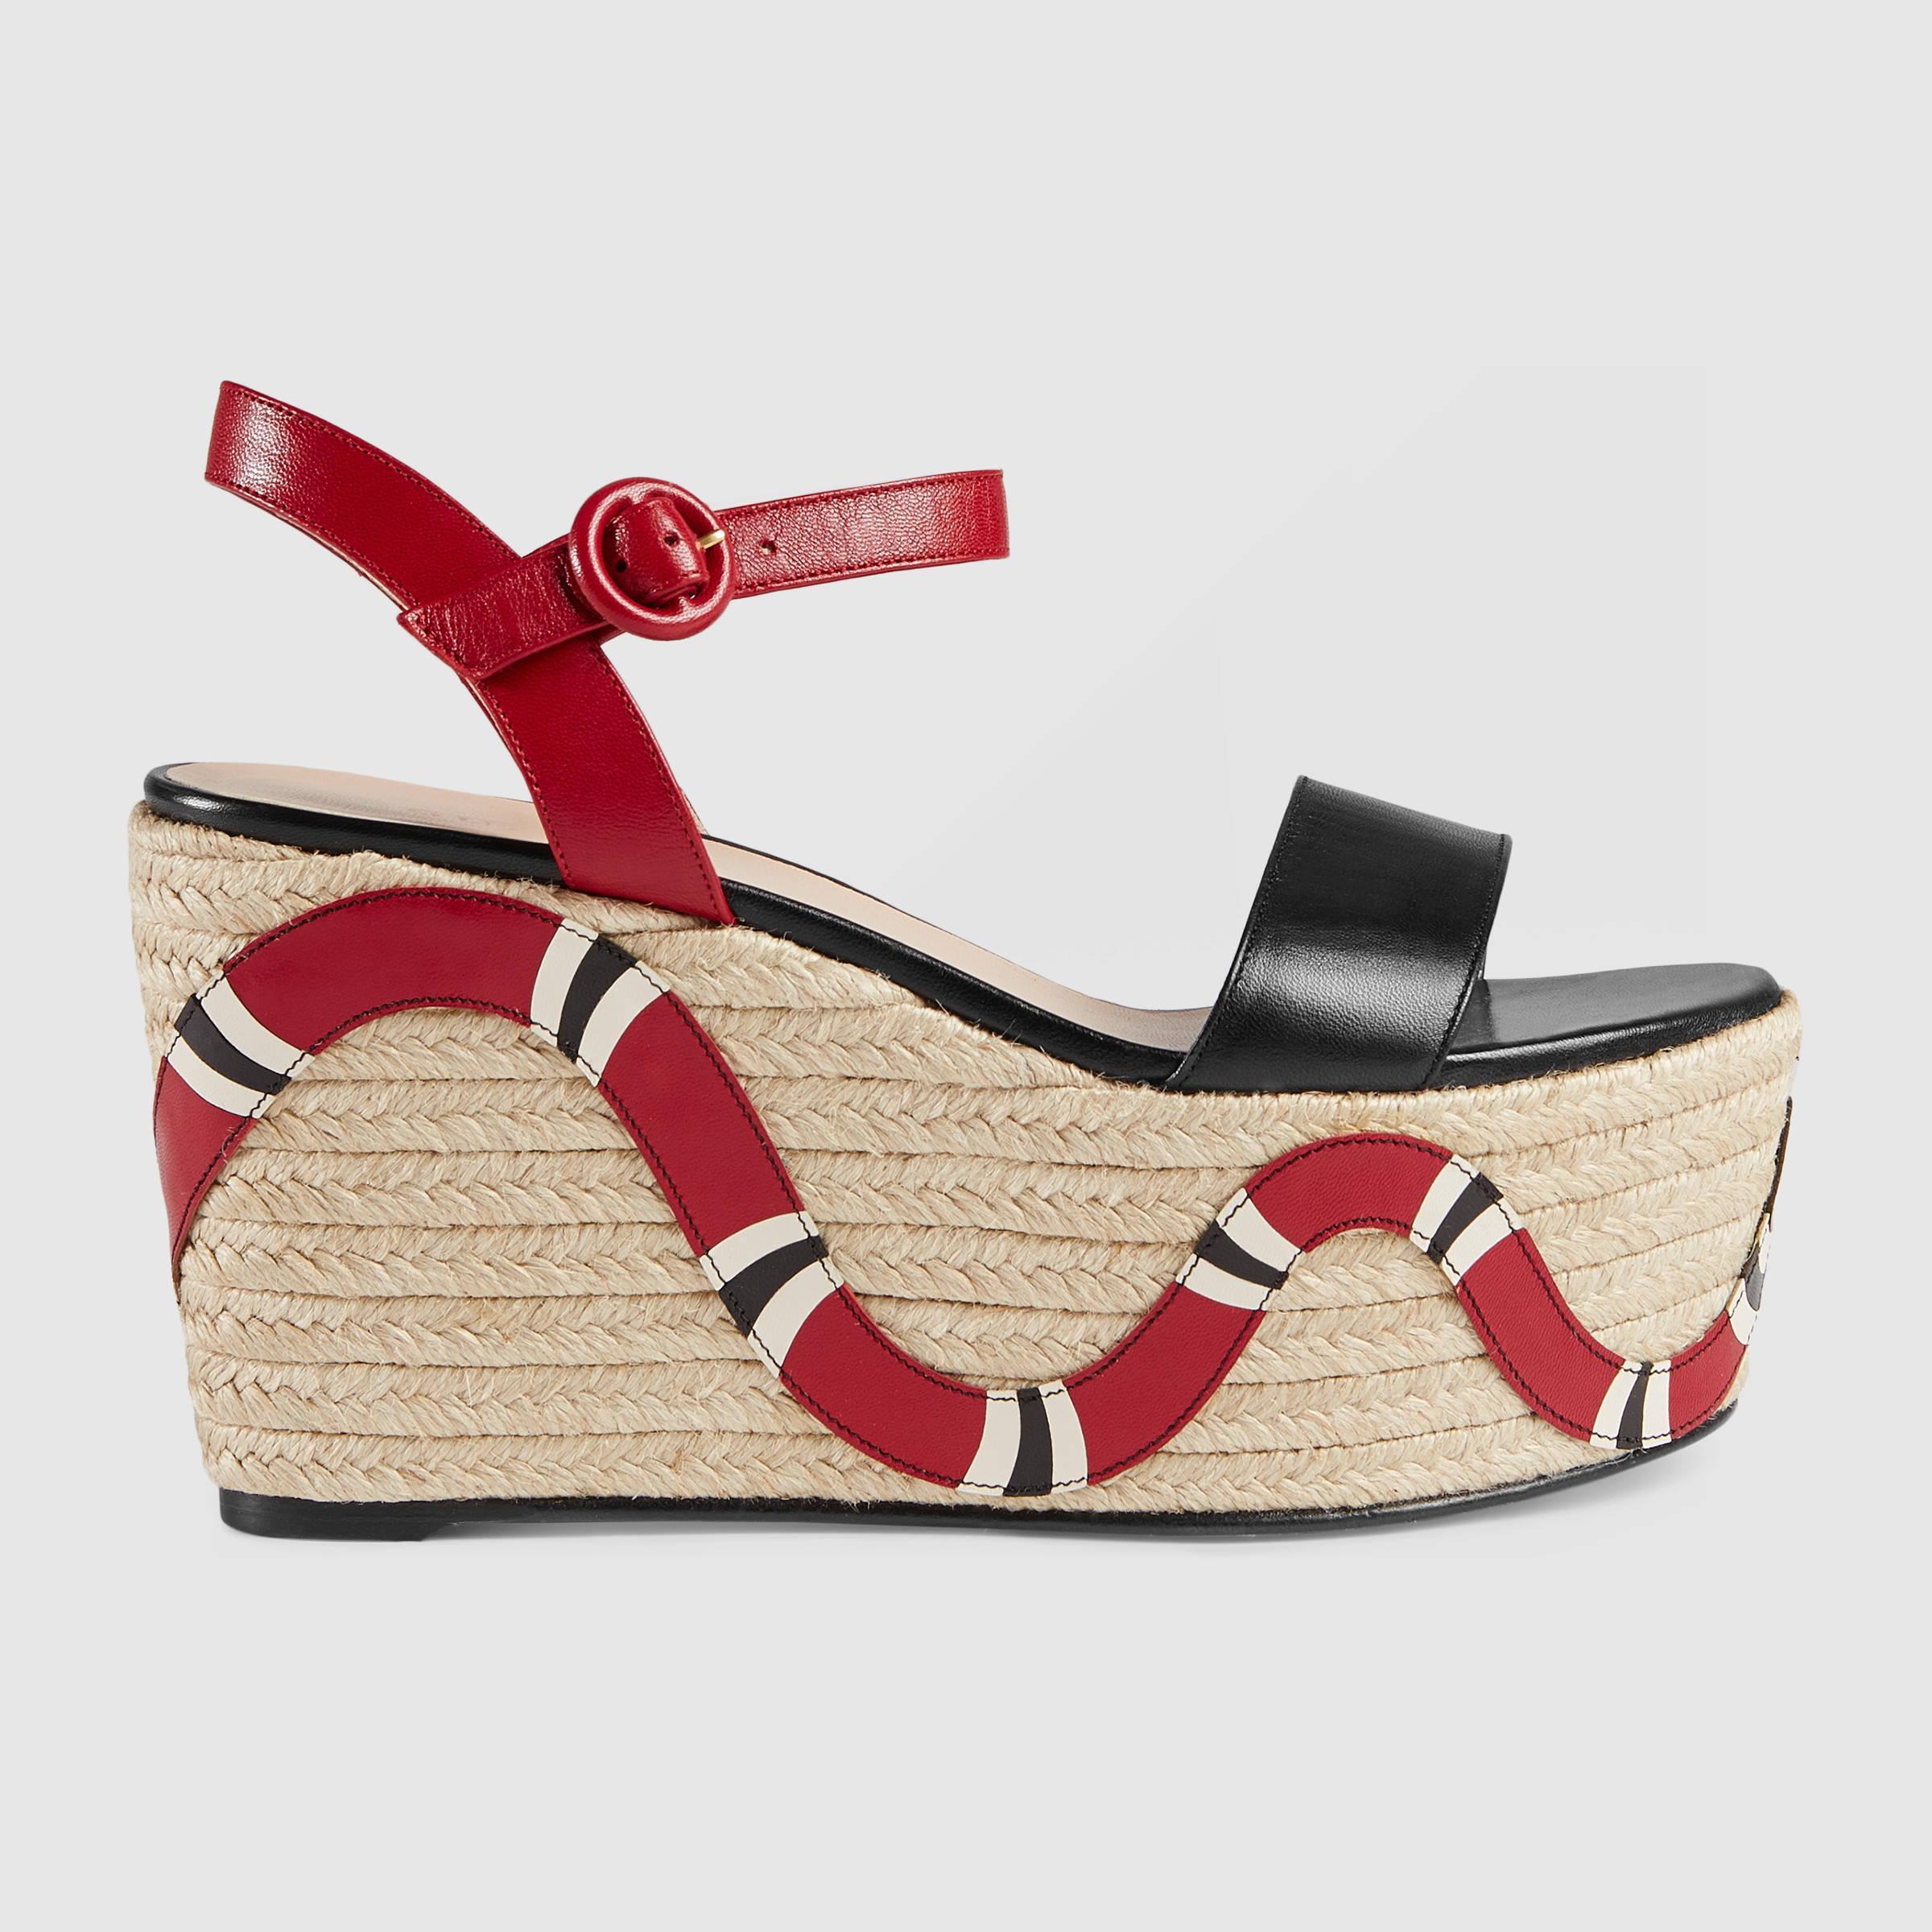 27c01514a3c1d Lyst - Gucci Barbette Espadrille Wedge Sandal in Black